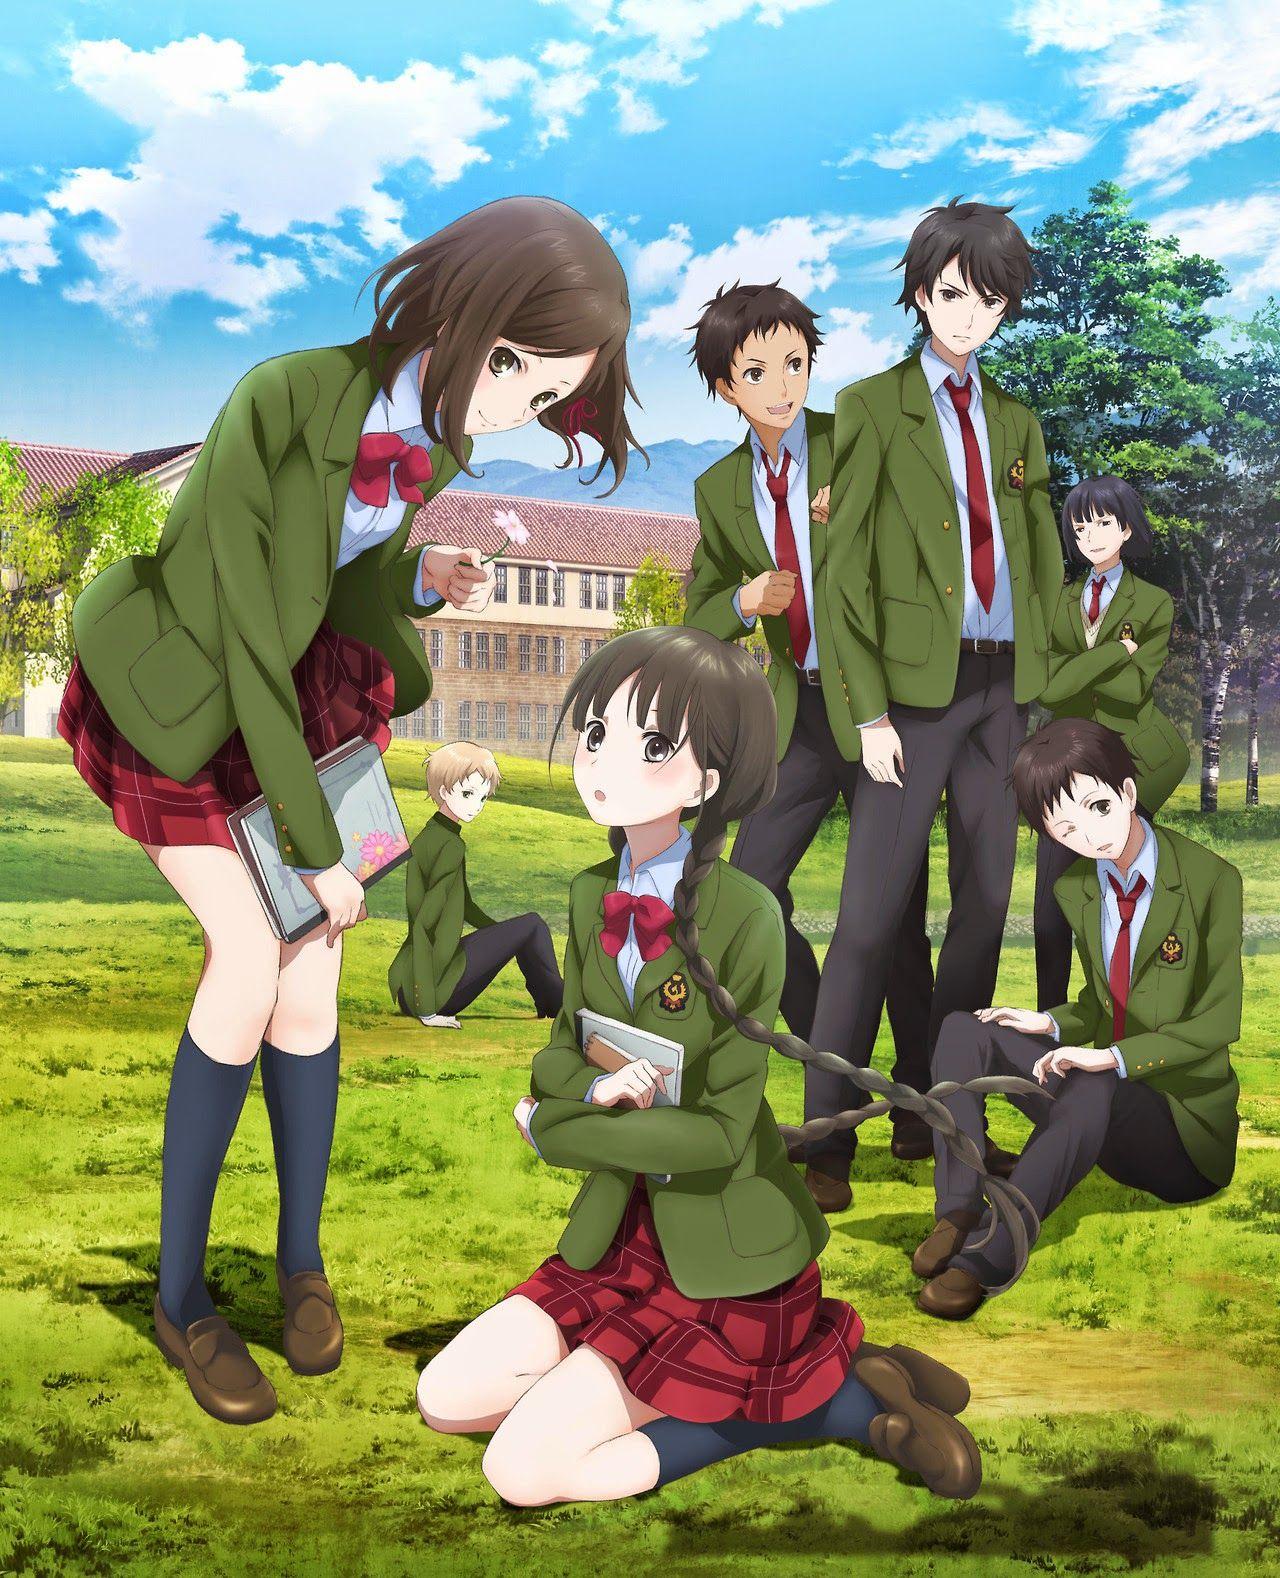 RDG Red Data Girl Anime, Tudo anime e Anime kawaii